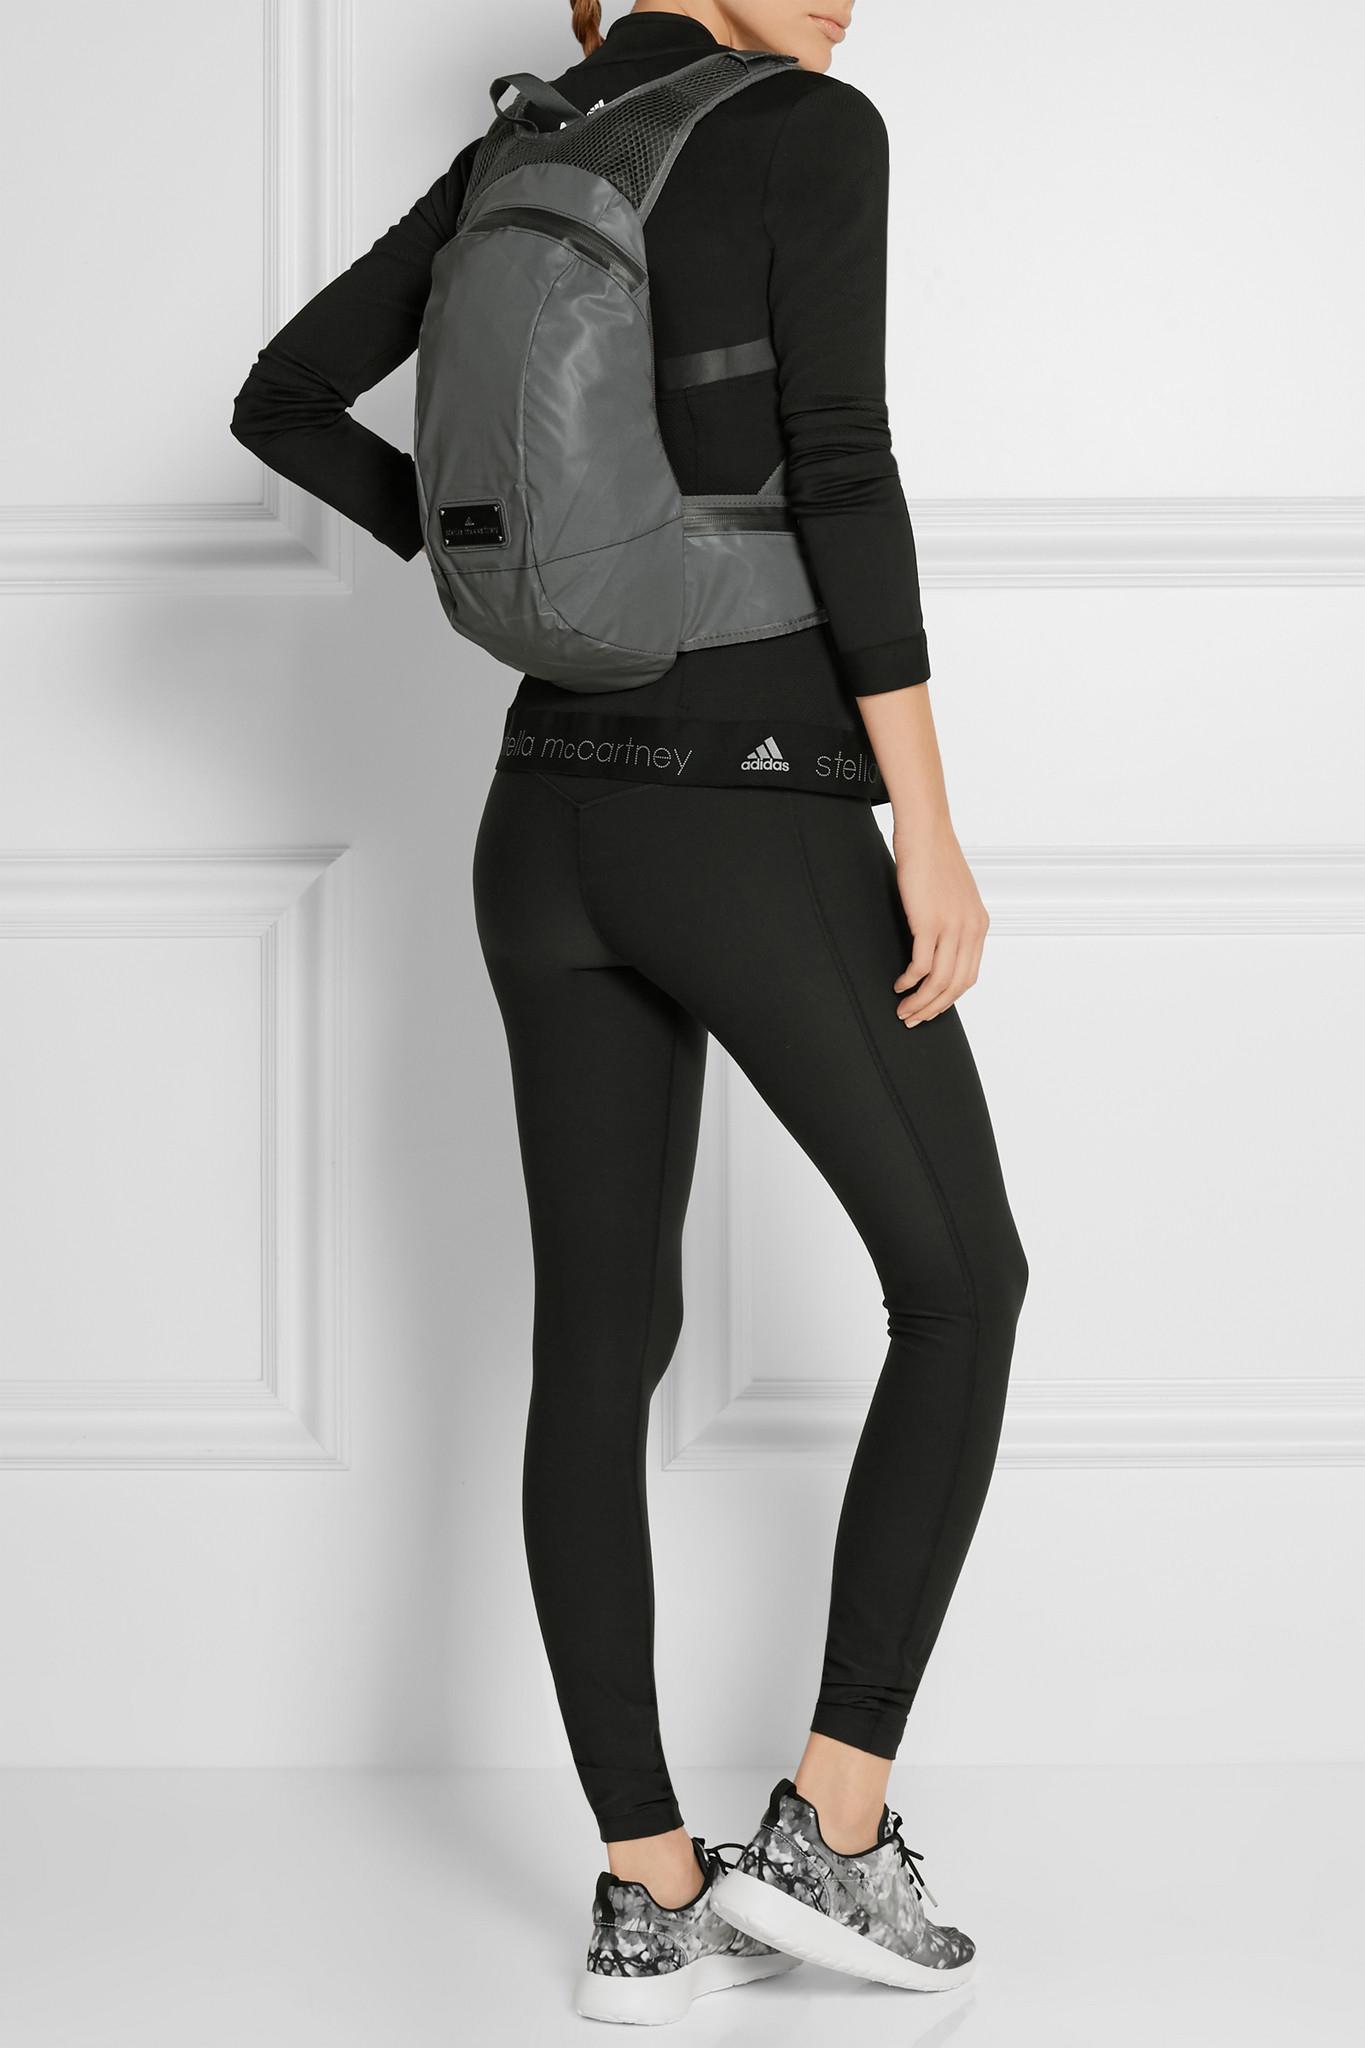 3b88a45738dc adidas By Stella McCartney Reflective Backpack - Grey in Gray - Lyst